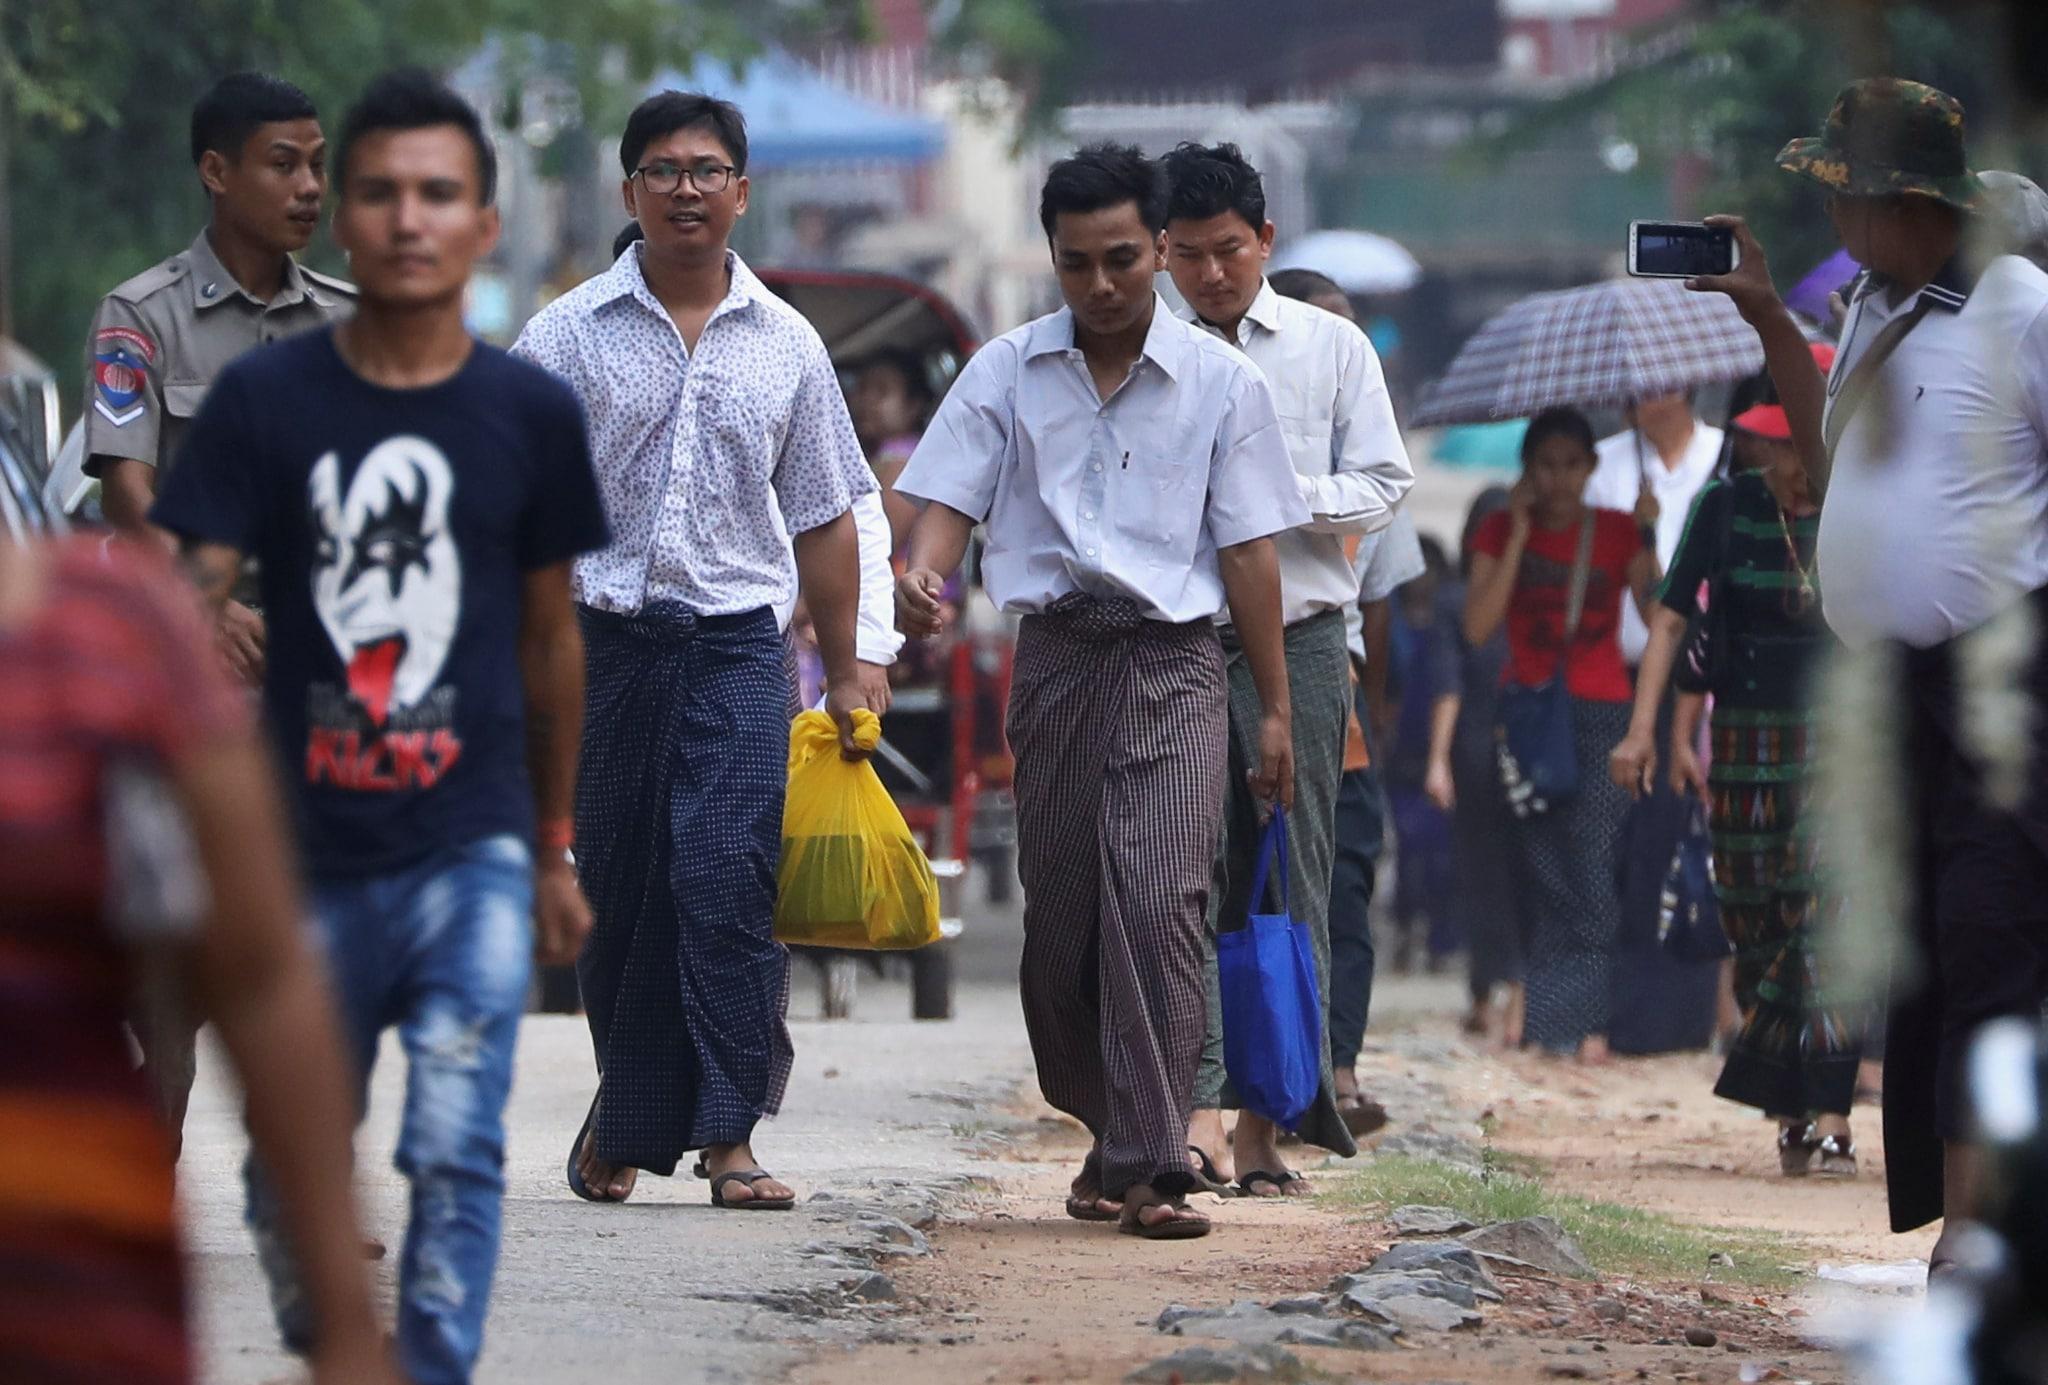 Reuters reporters Wa Lone and Kyaw Soe Oo walk free outside Insein prison after receiving a presidential pardon in Yangon, Myanmar, May 7, 2019. REUTERS/Ann Wang